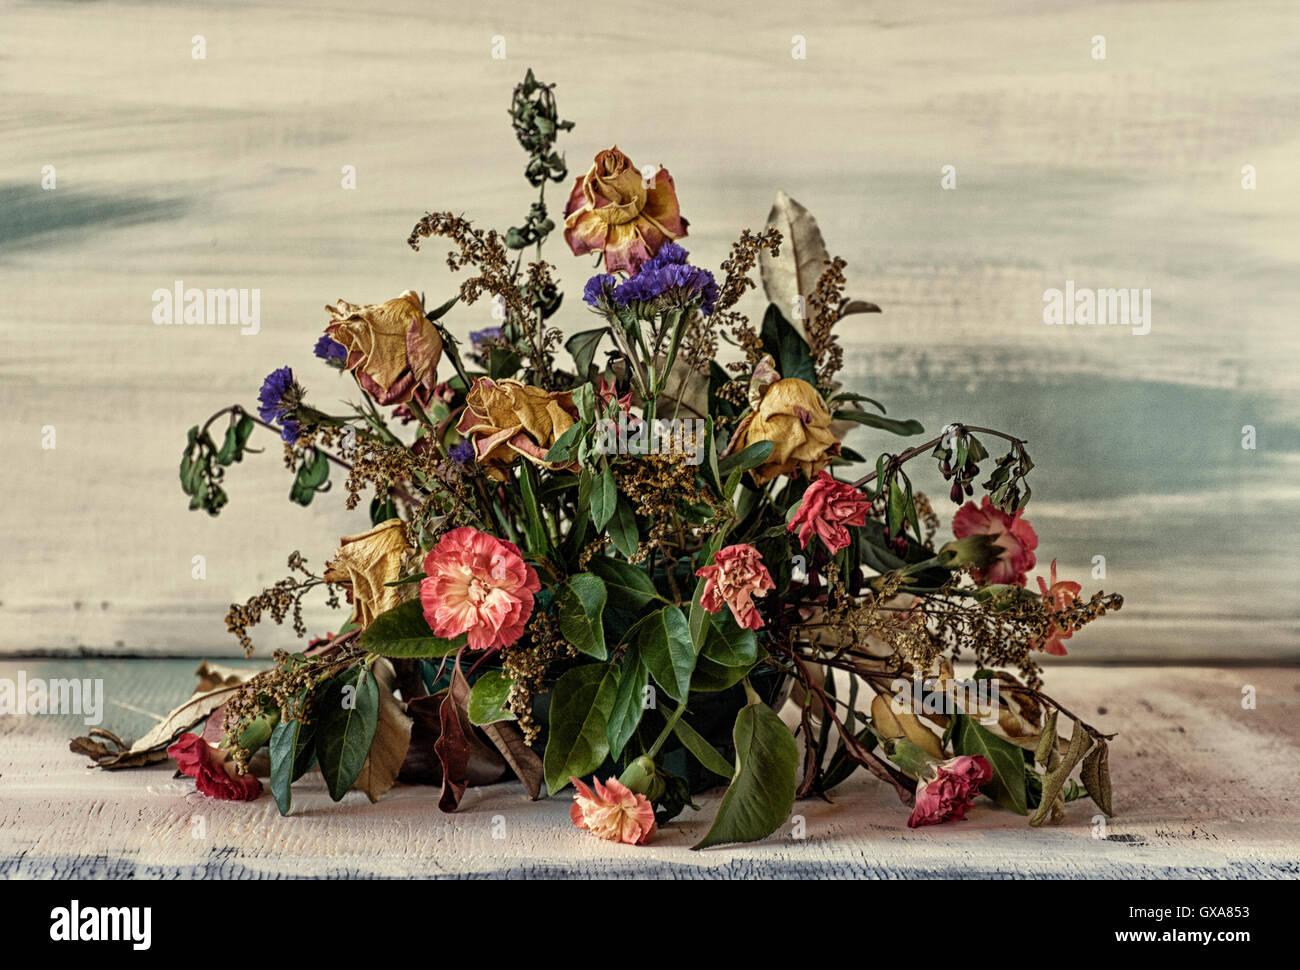 Dead Flower Arrangement Stock Photos & Dead Flower Arrangement Stock ...